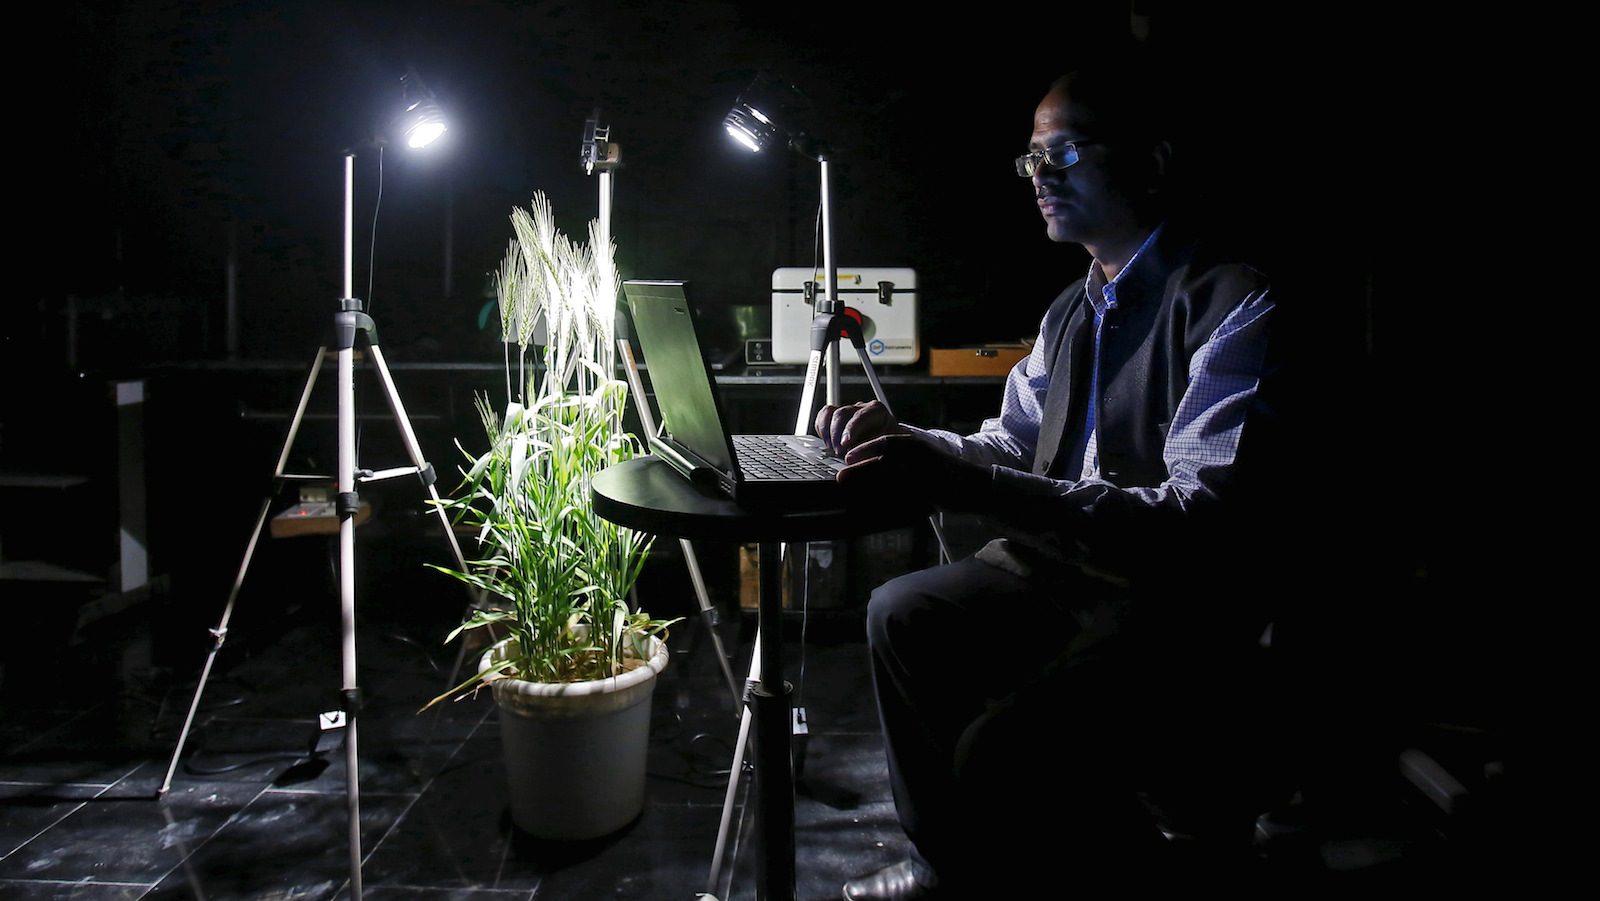 IARI senior scientist Sahoo analyzes satellite images inside a laboratory in New Delhi